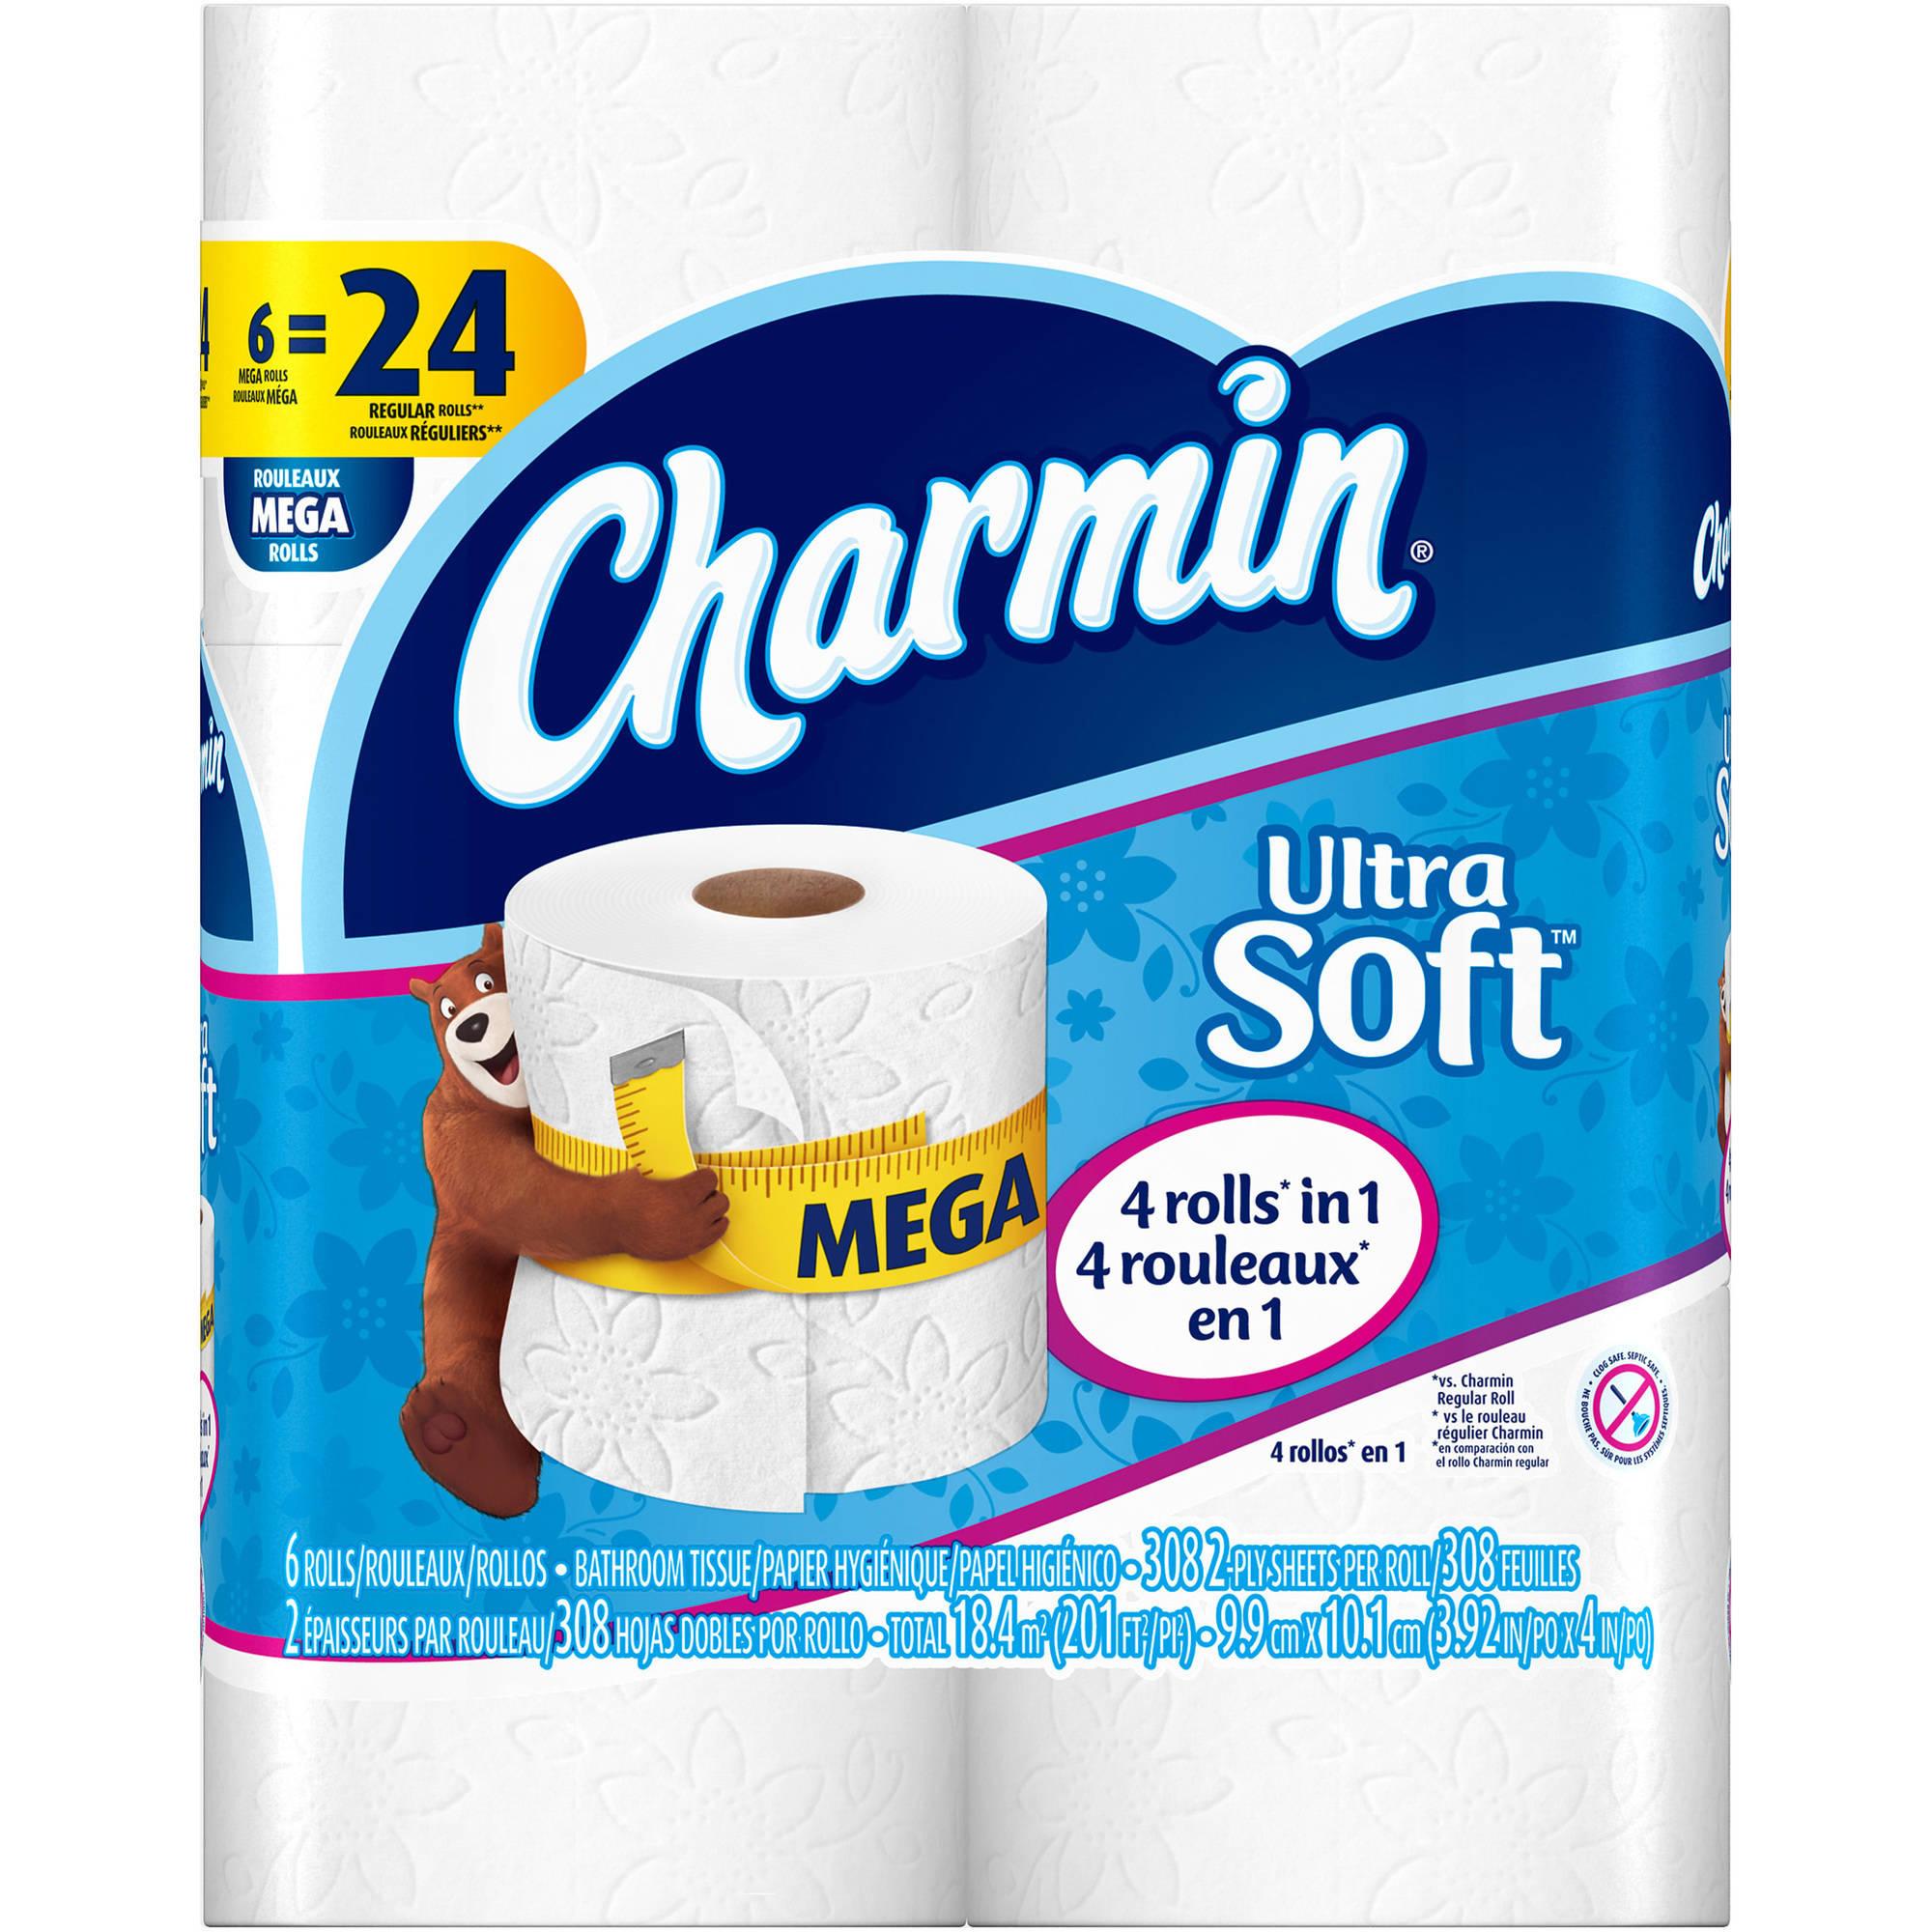 Charmin Ultra Soft Toilet Paper Mega Rolls, 308 sheets, 6 rolls